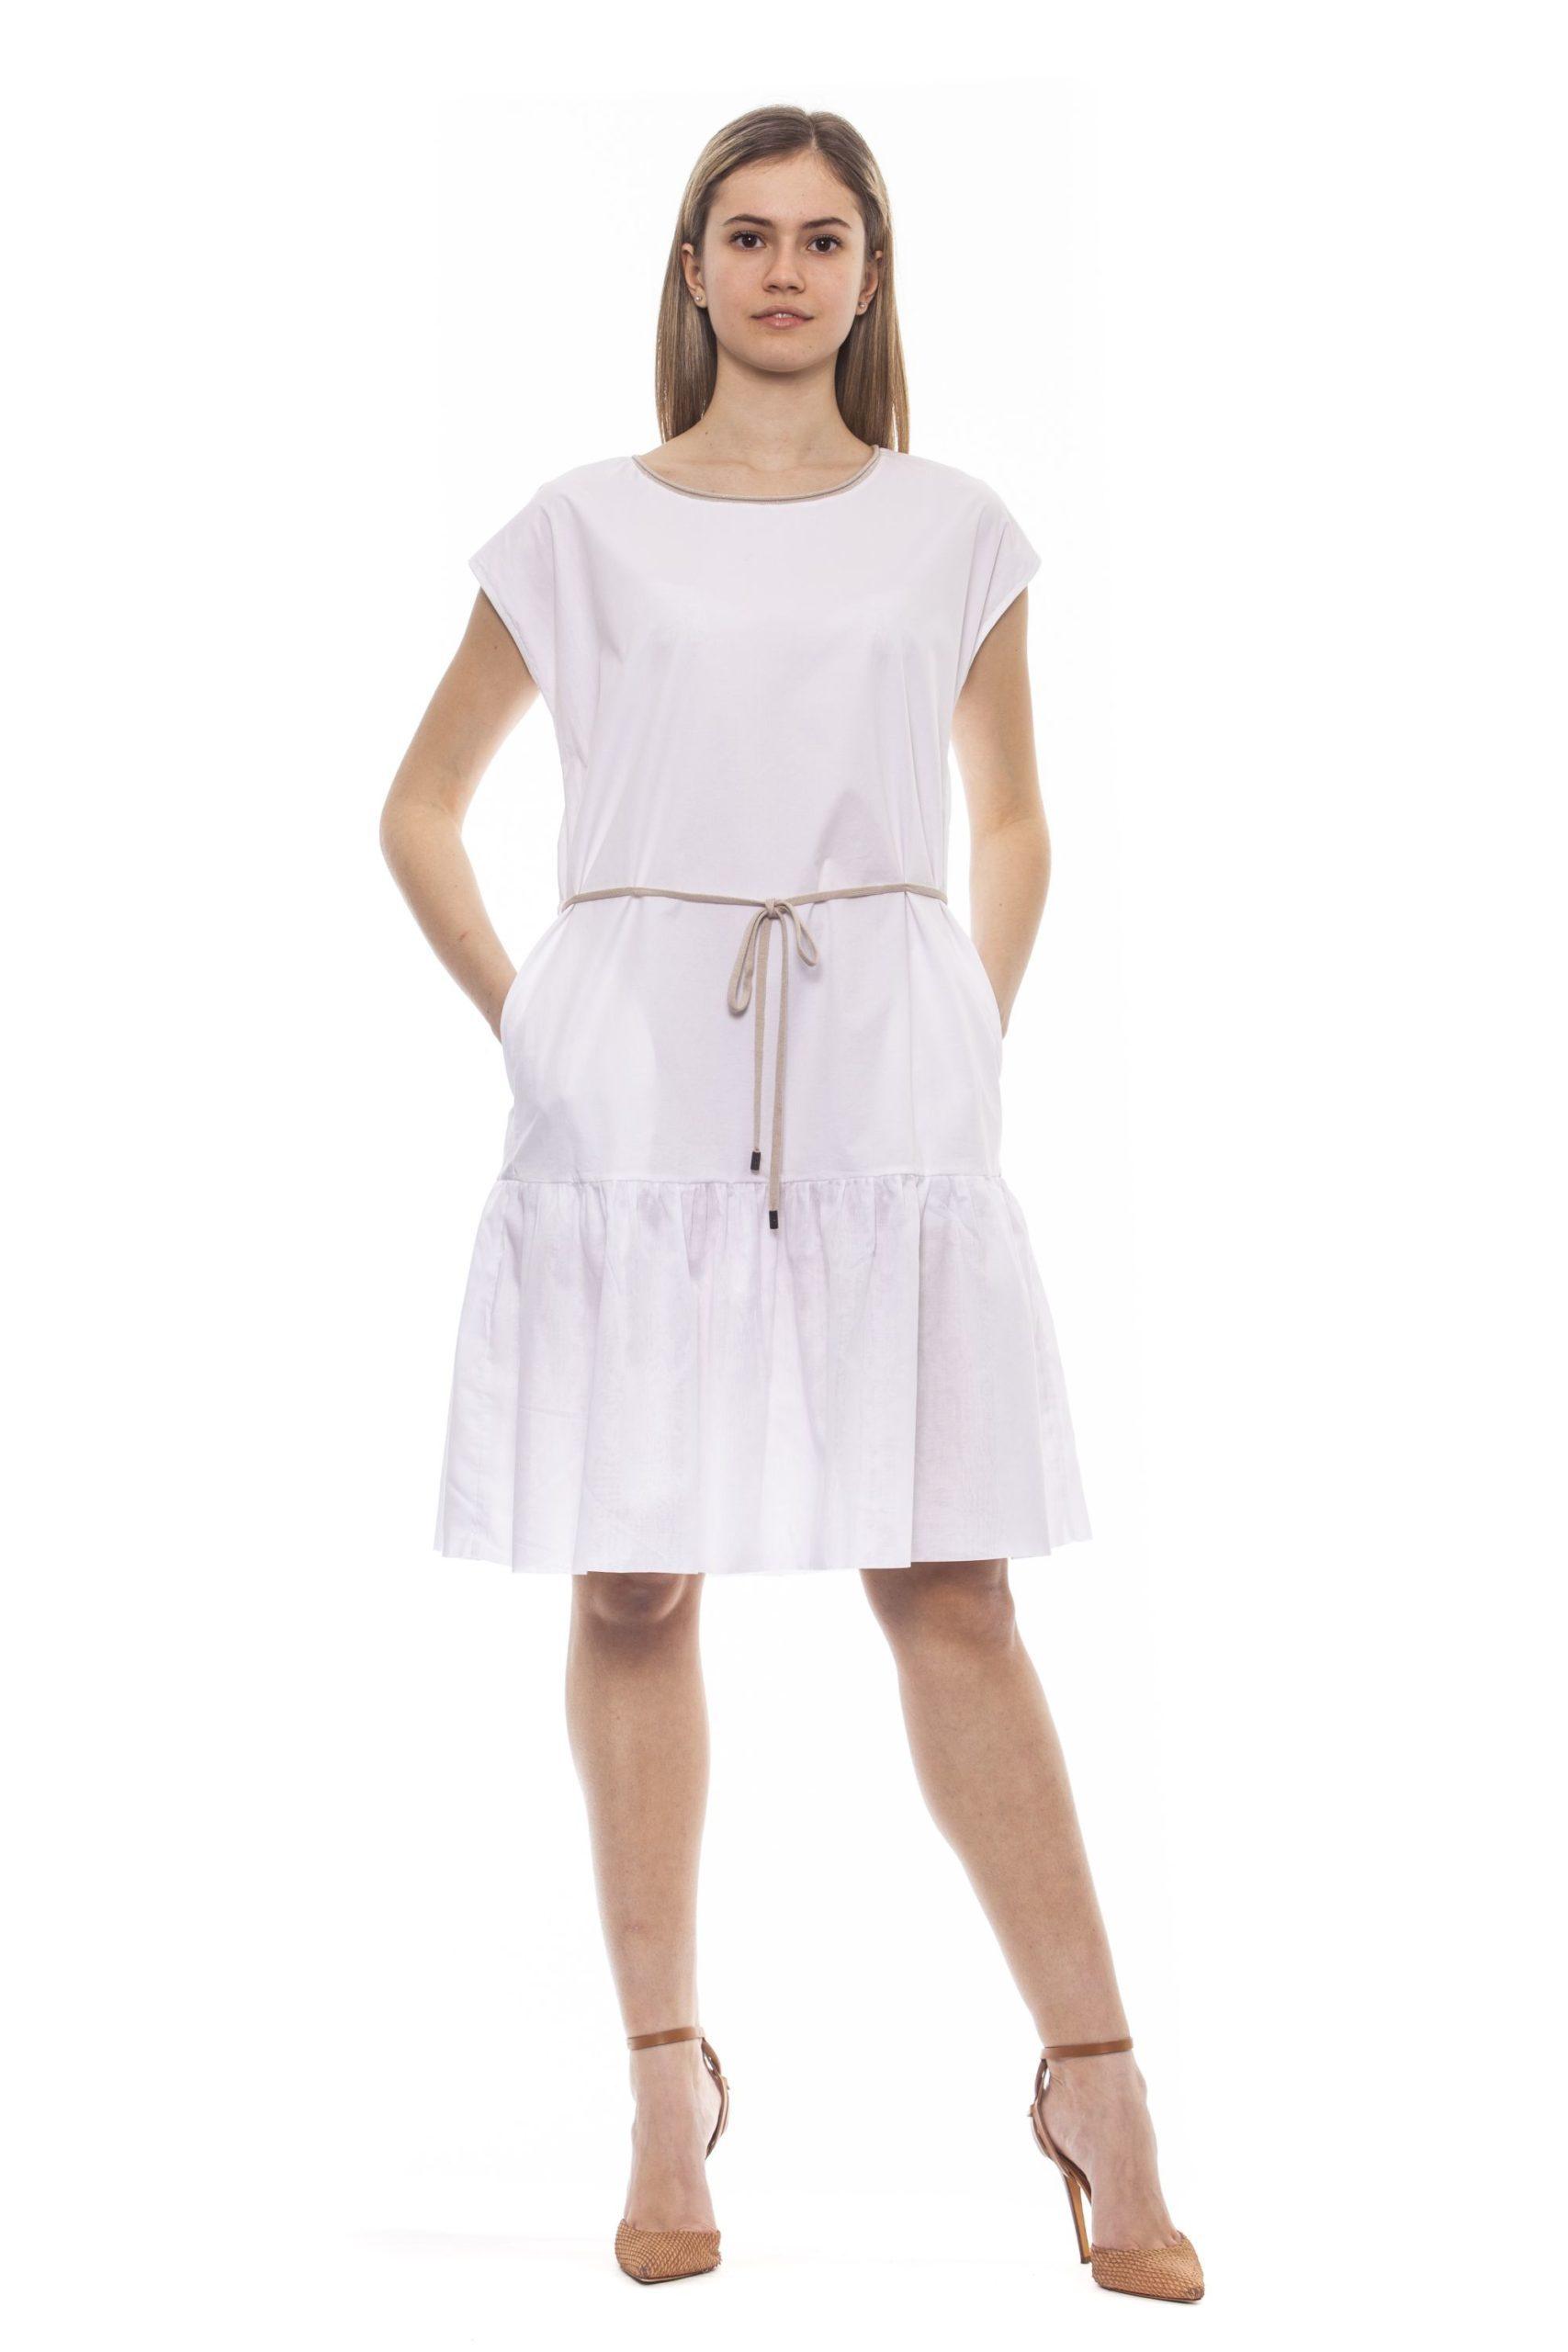 Peserico Women's Bianco Dress White PE1381692 - IT42 | S